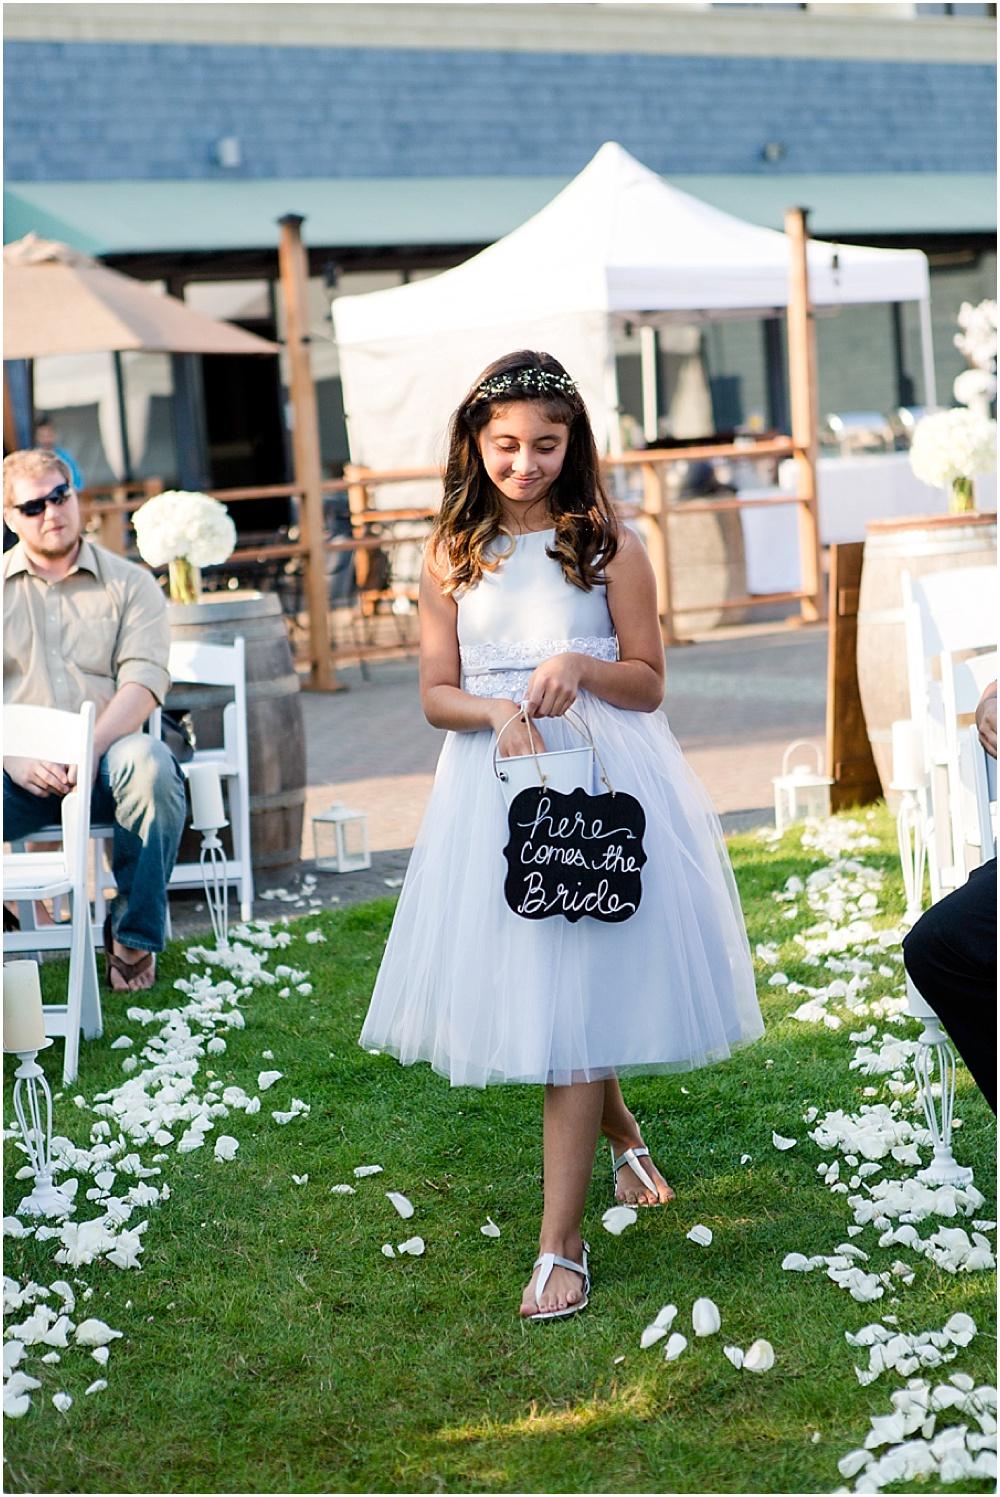 mitzner_silverdale_beach_hotel_wedding_silverdale_washington_pacific_northwest_wedding_photographer_0056